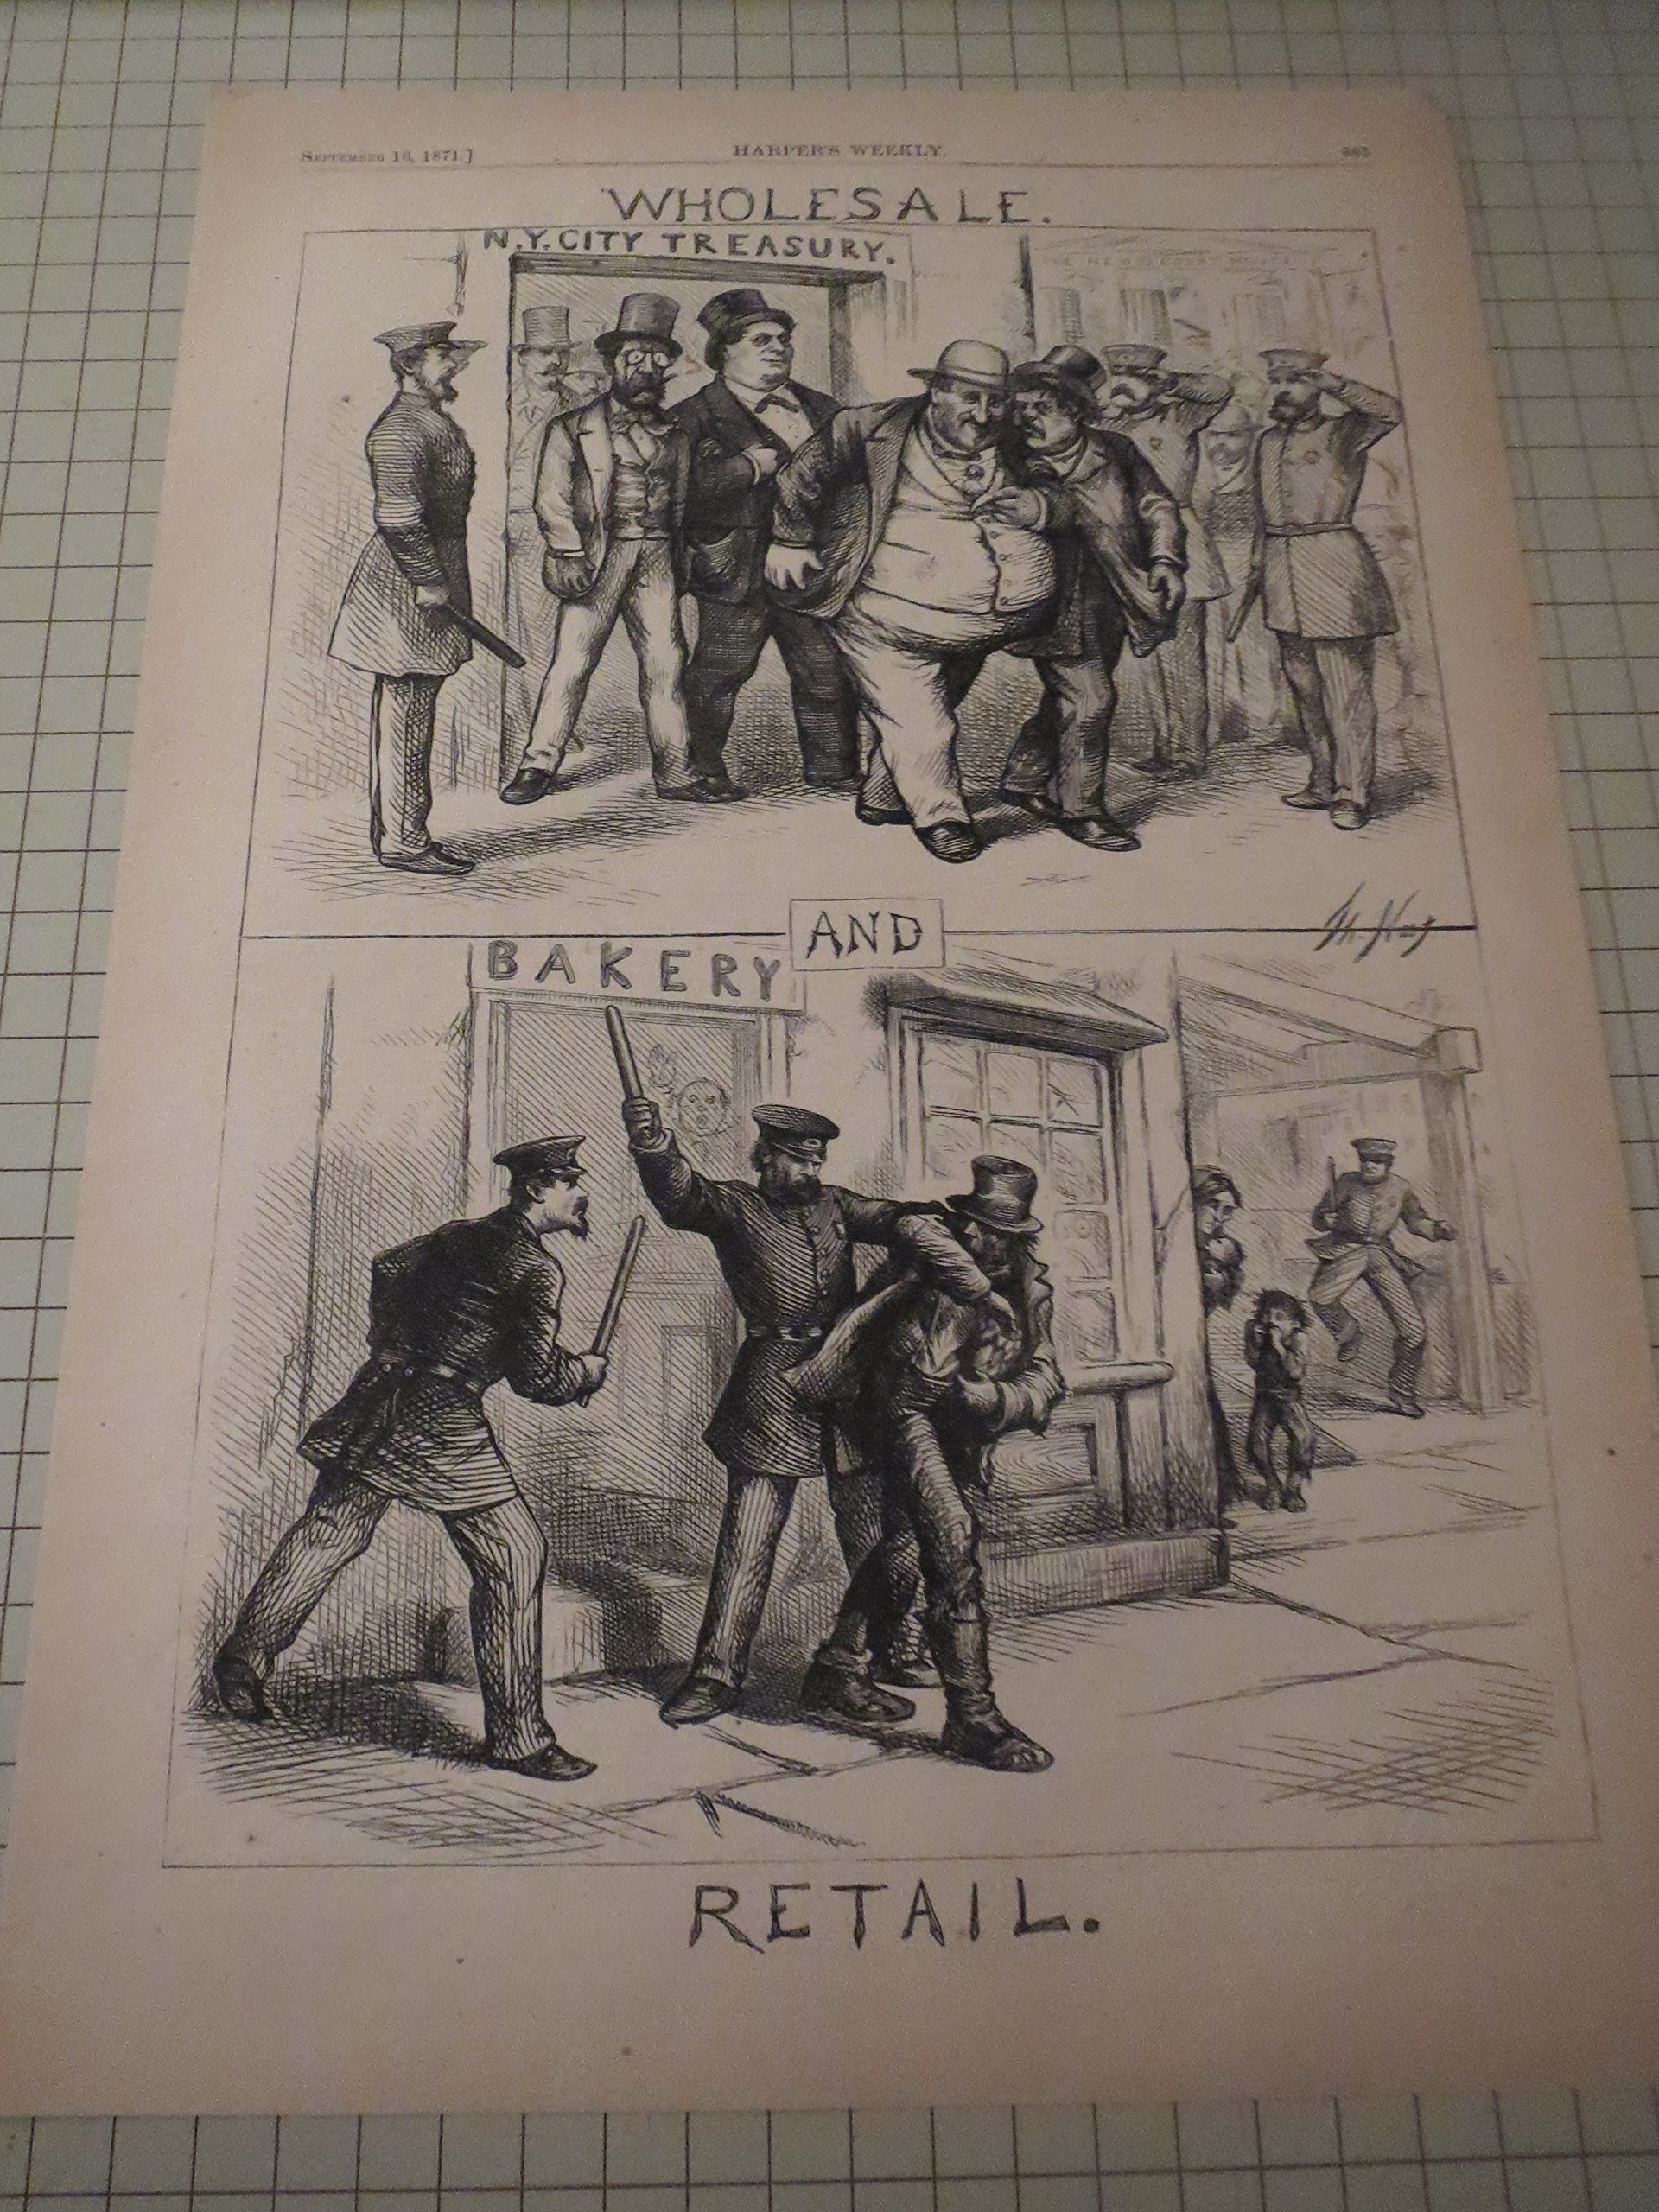 1871 Hw Thomas Nast Engraving Of 19th Century Justice